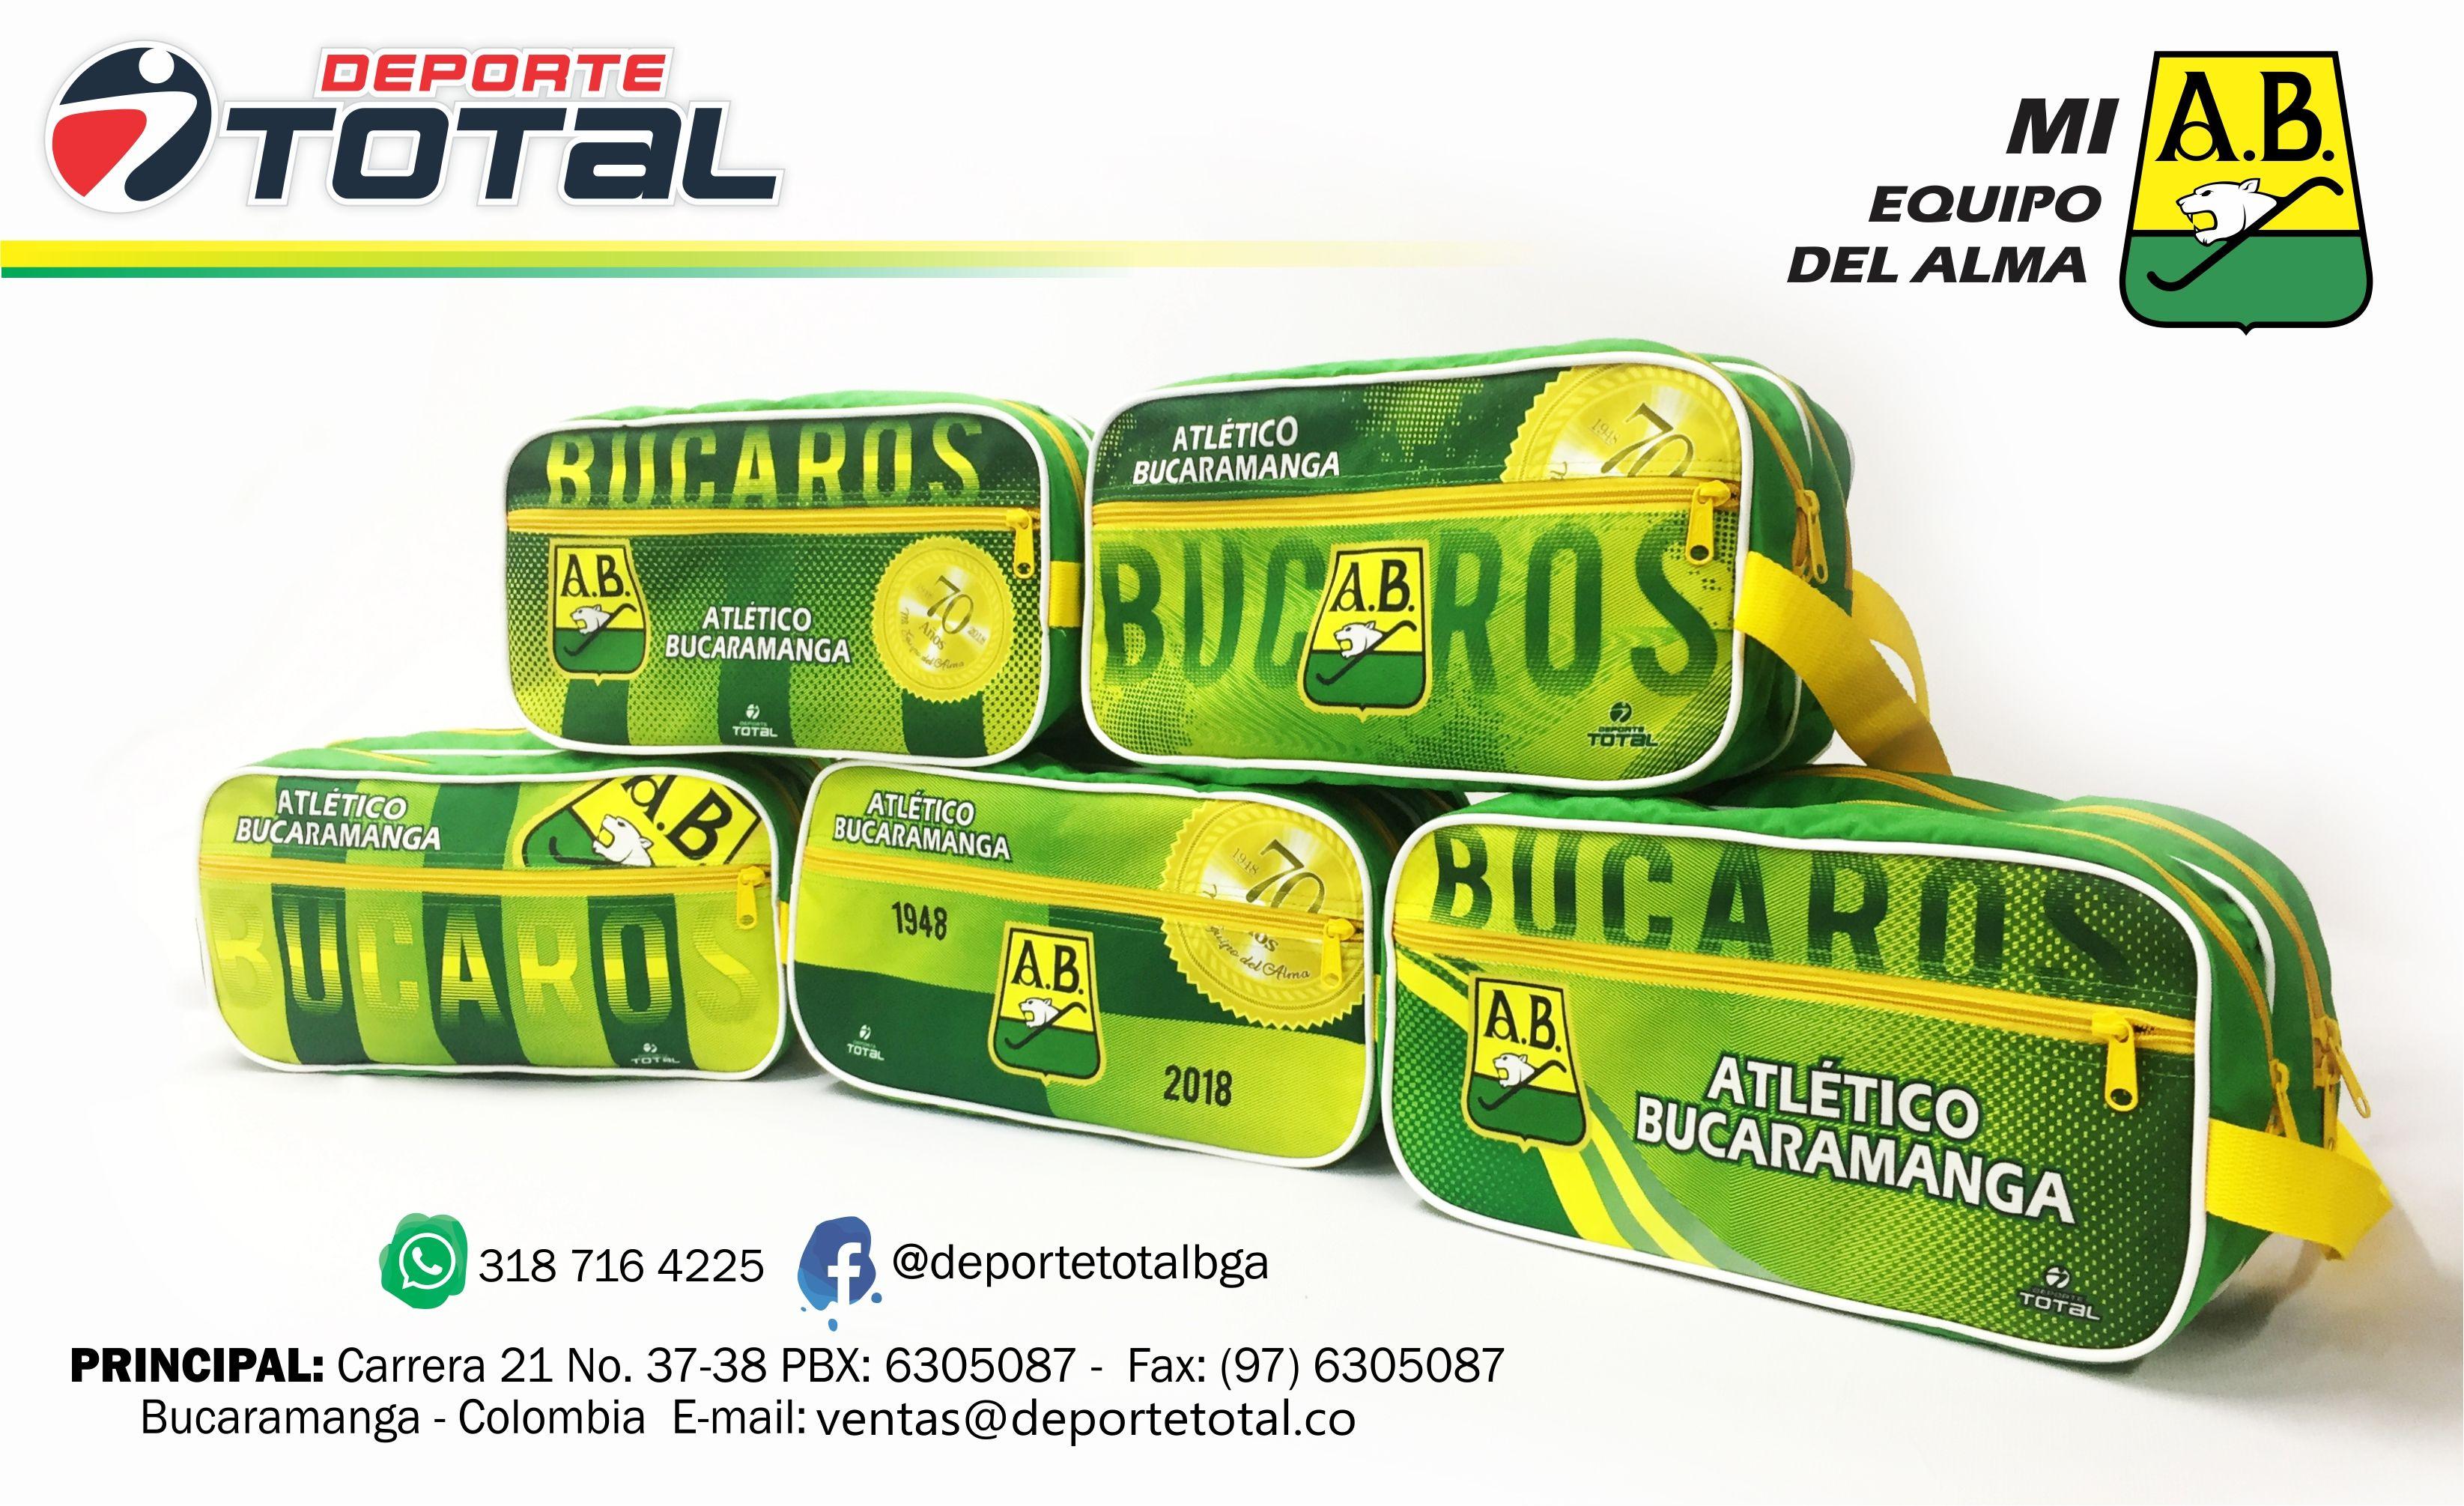 GUAYERA BOLSO DEPORTIVO FUTBOL - DEPORTE TOTAL - ATLETICO BUCARAMANGA -  COLOMBIA - TIENDA DEPORTIVA - 99ccf3d2306